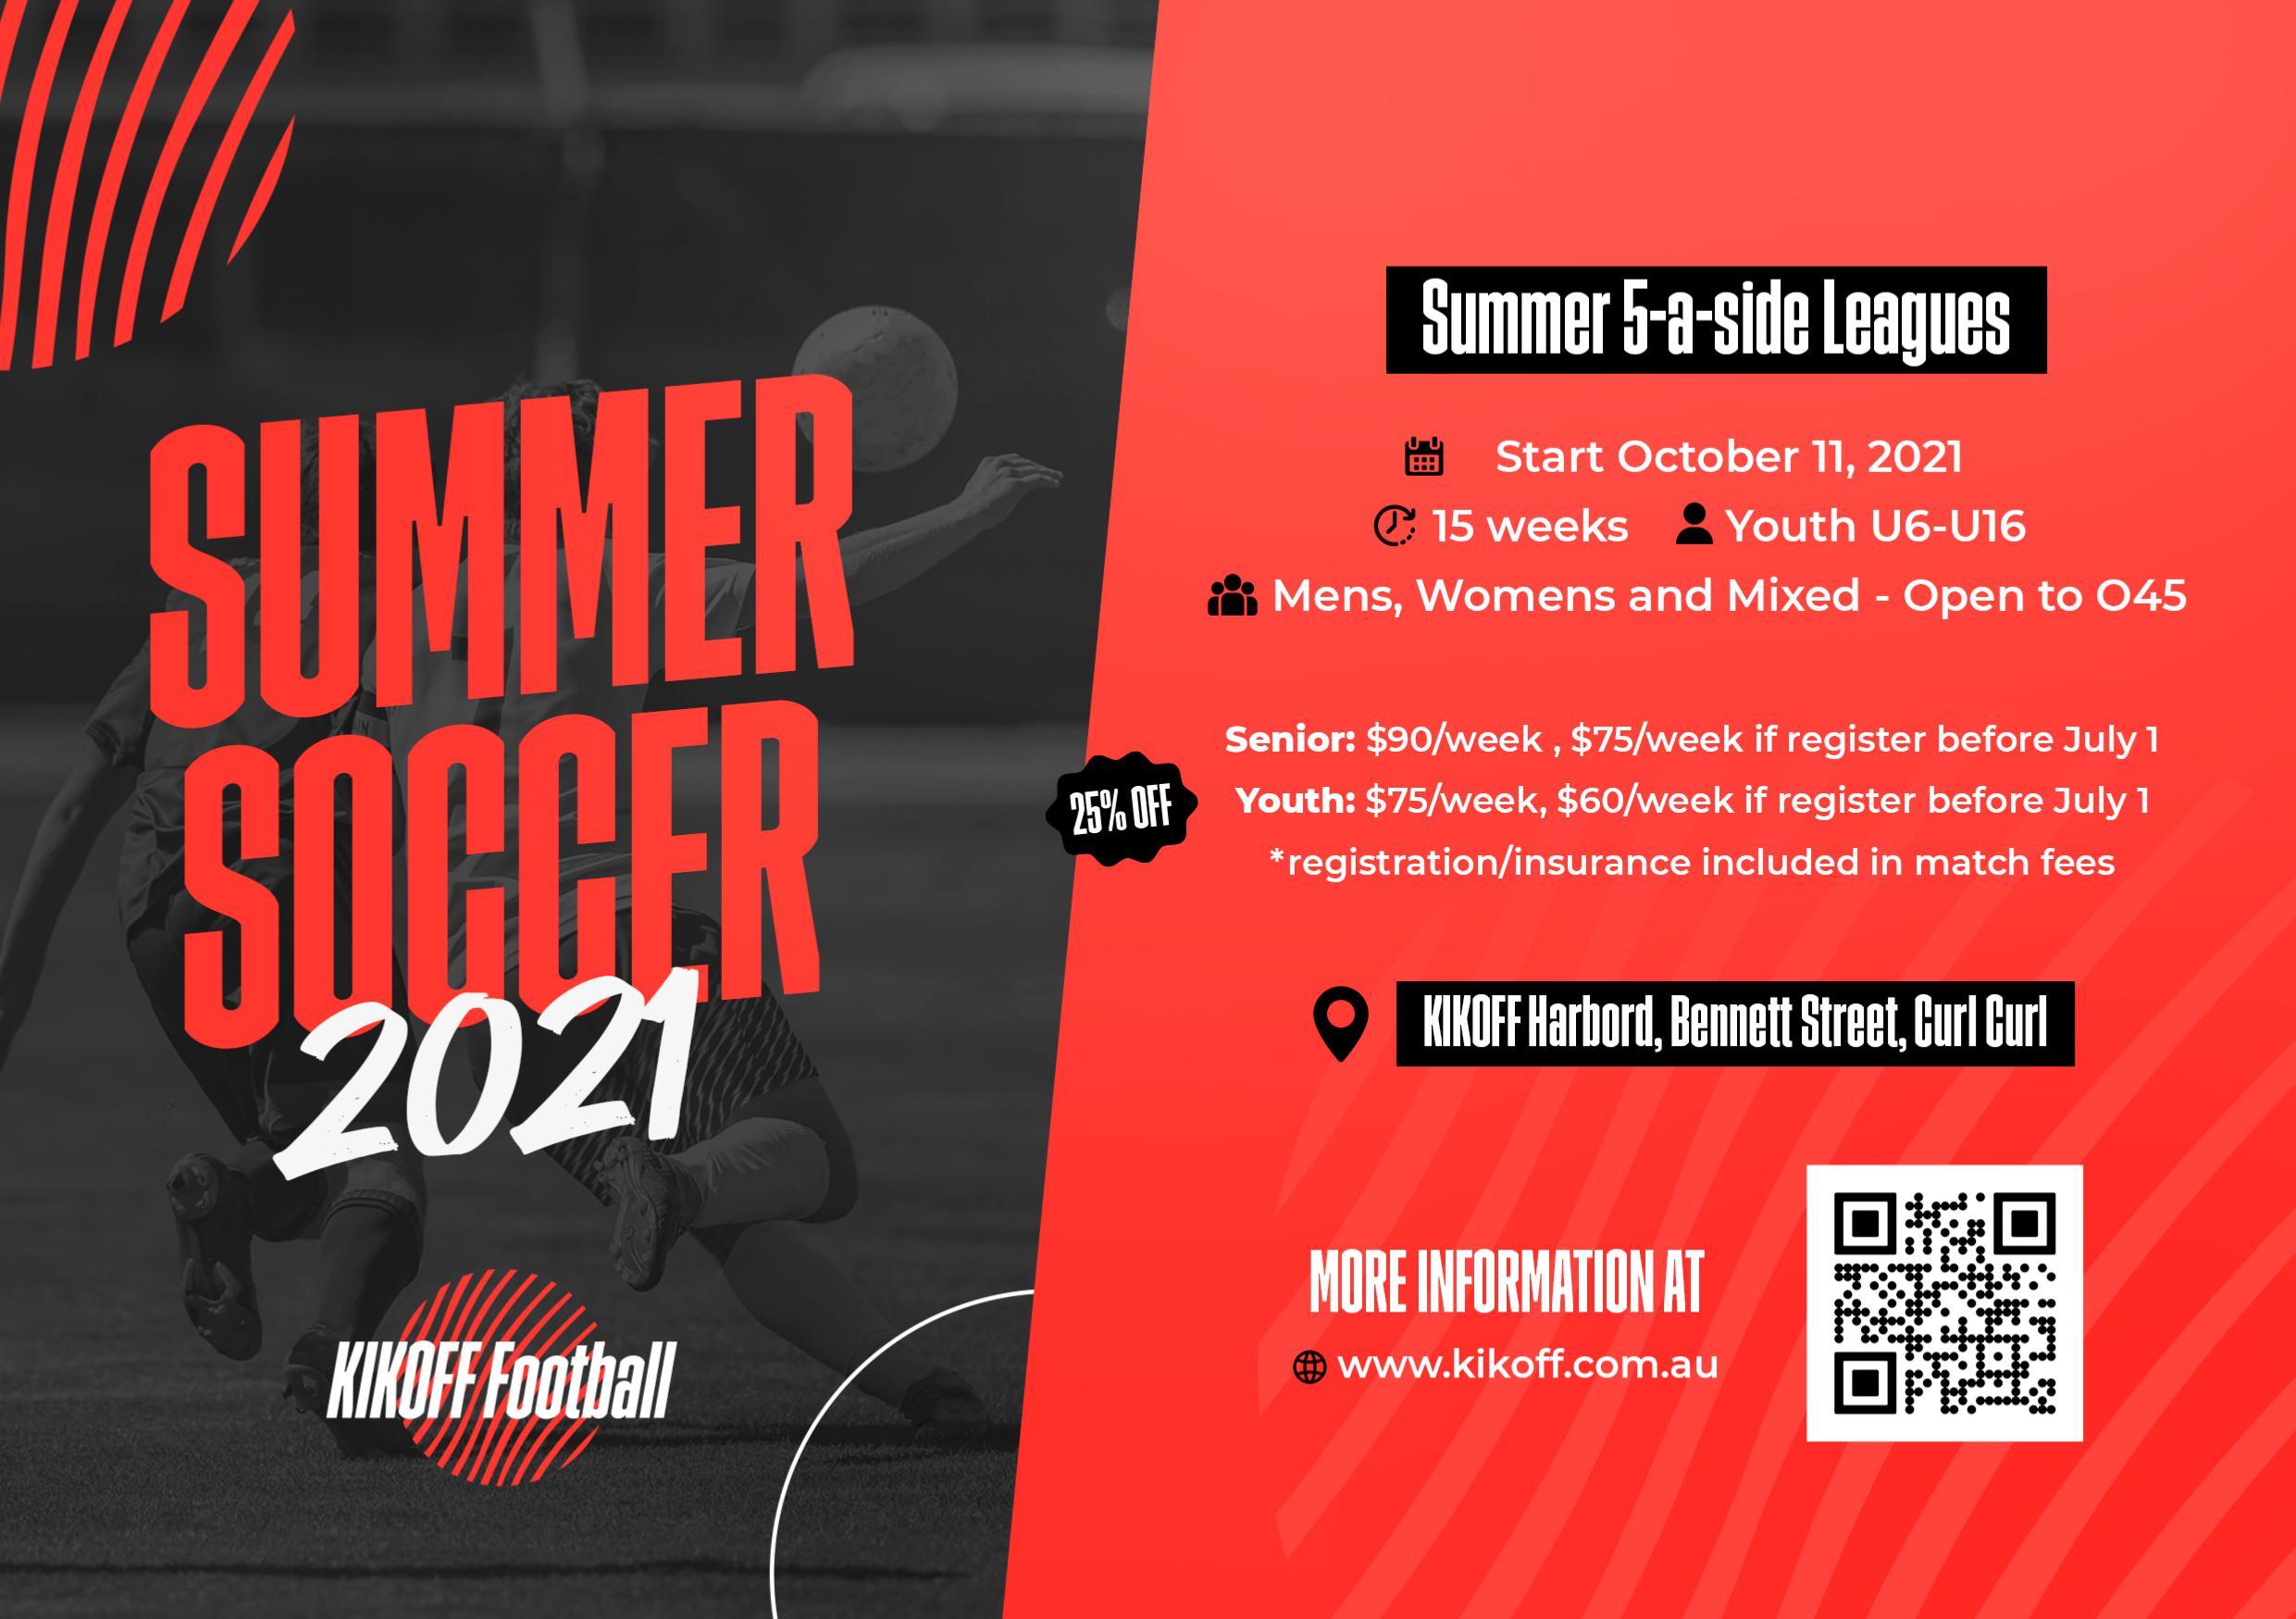 summer-soccer-flyer-HARBORD-3